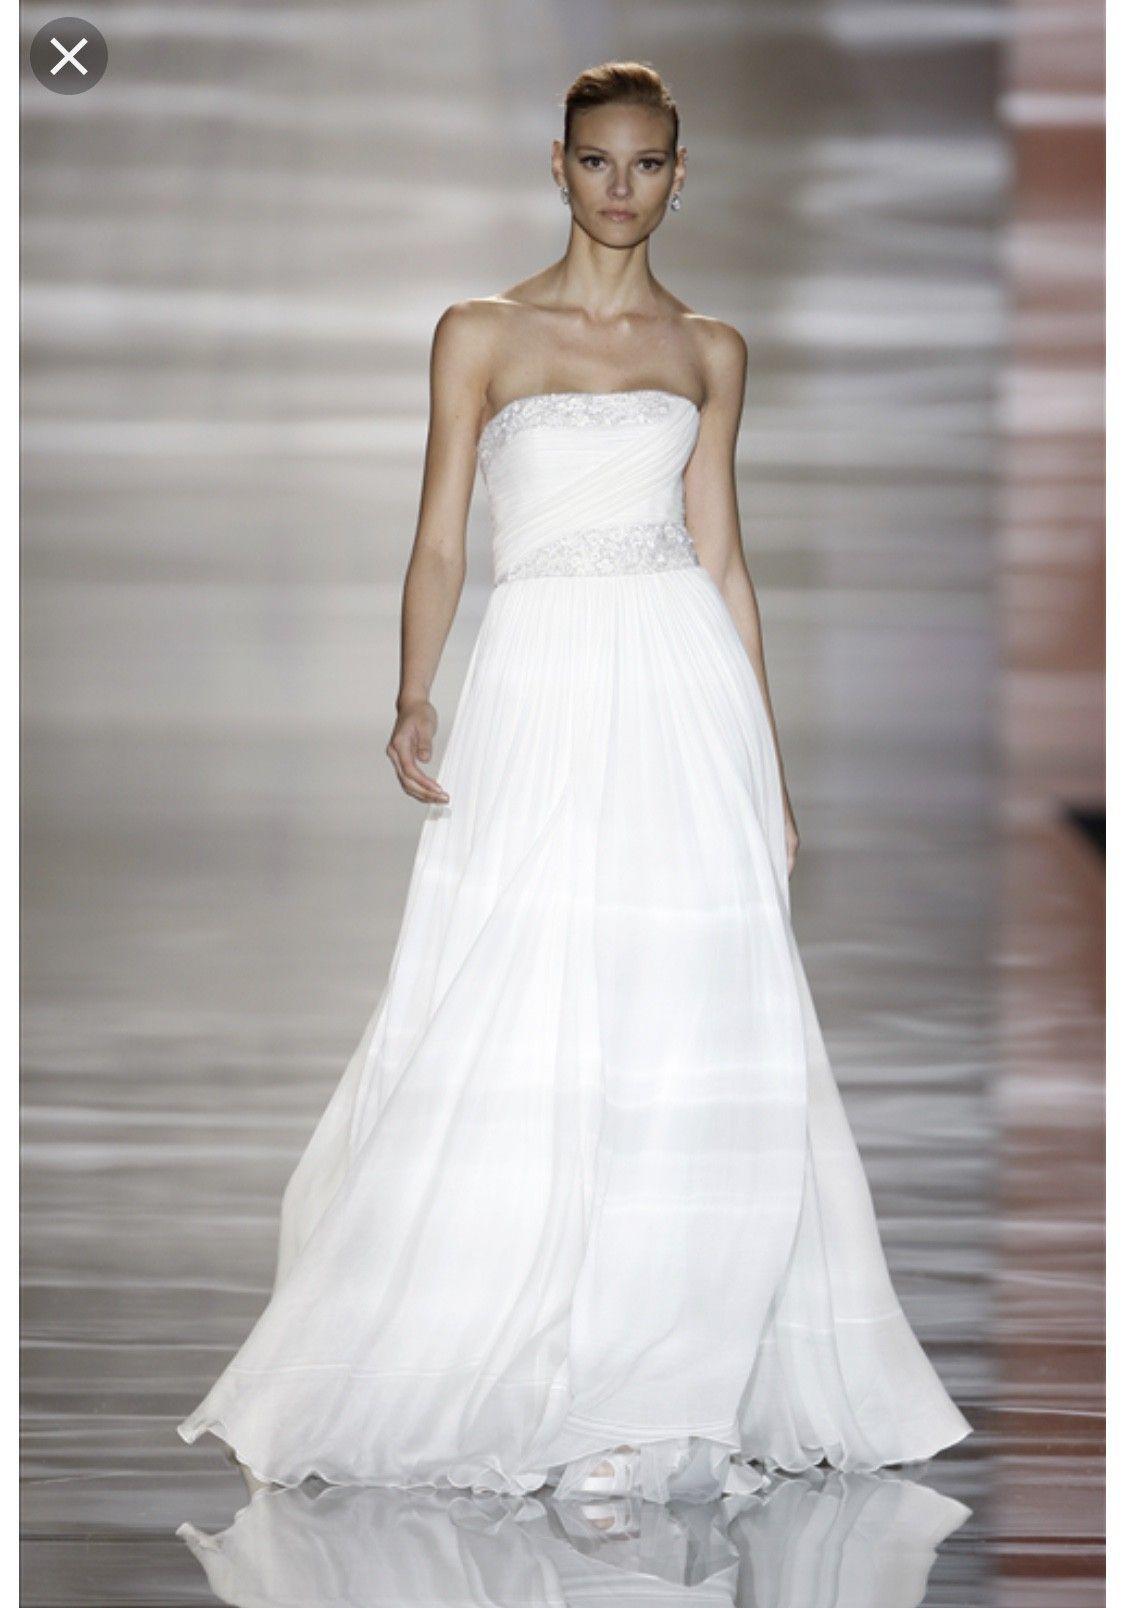 Elie Saab Pisces Wedding Dress Wedding Dresses Wedding Dresses